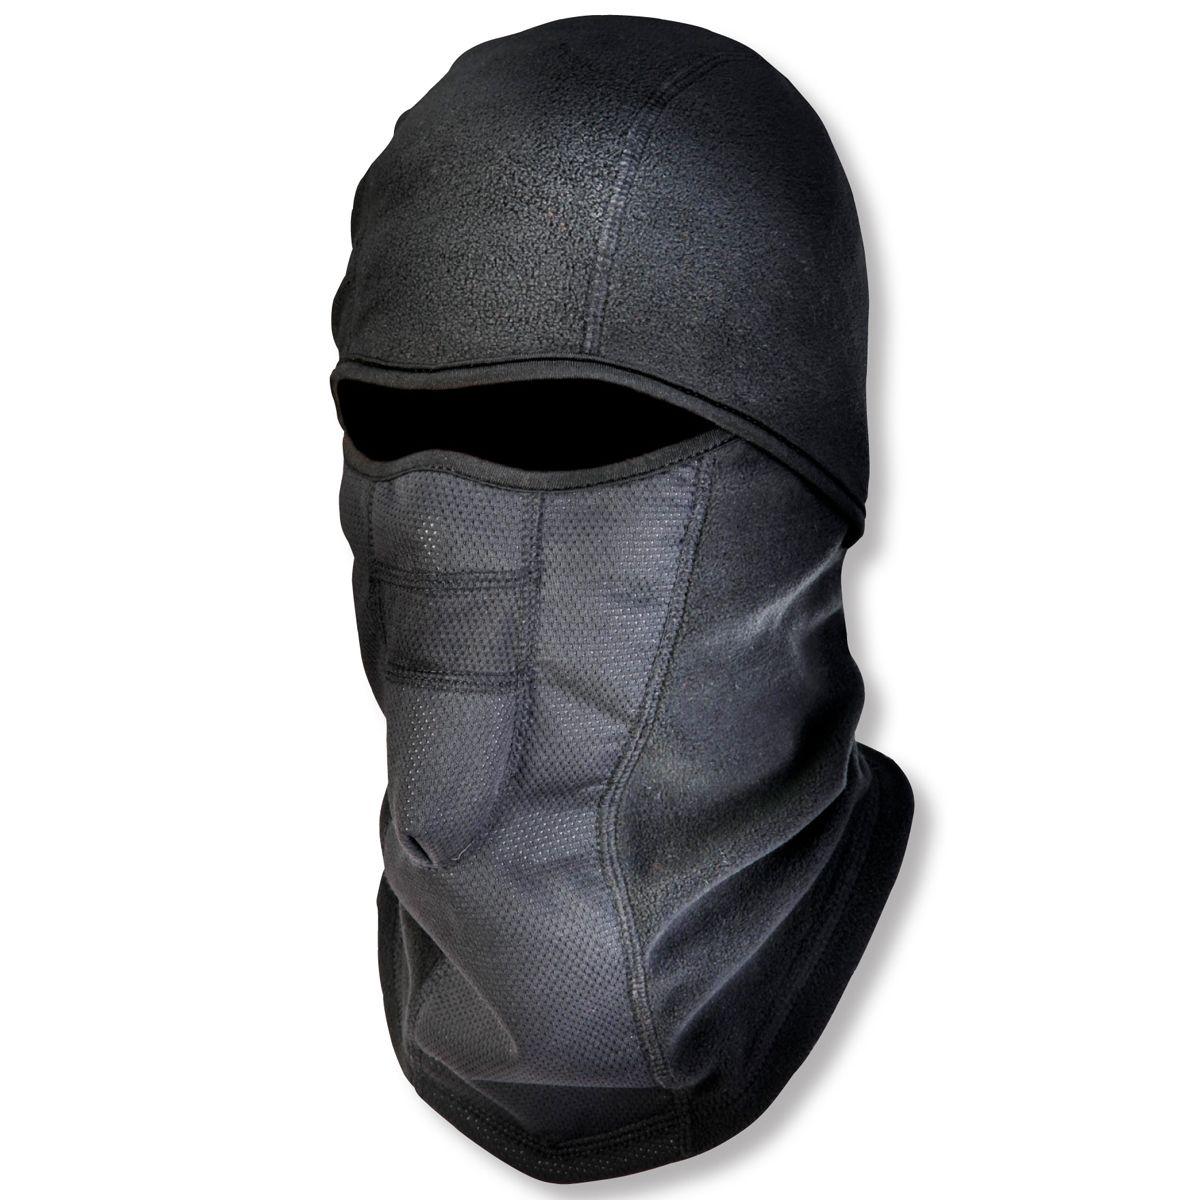 Ergodyne N Ferno 6823 Wind Proof Hinged Balaclava Black Winter Face Mask Ski Mask Outfit Accessories